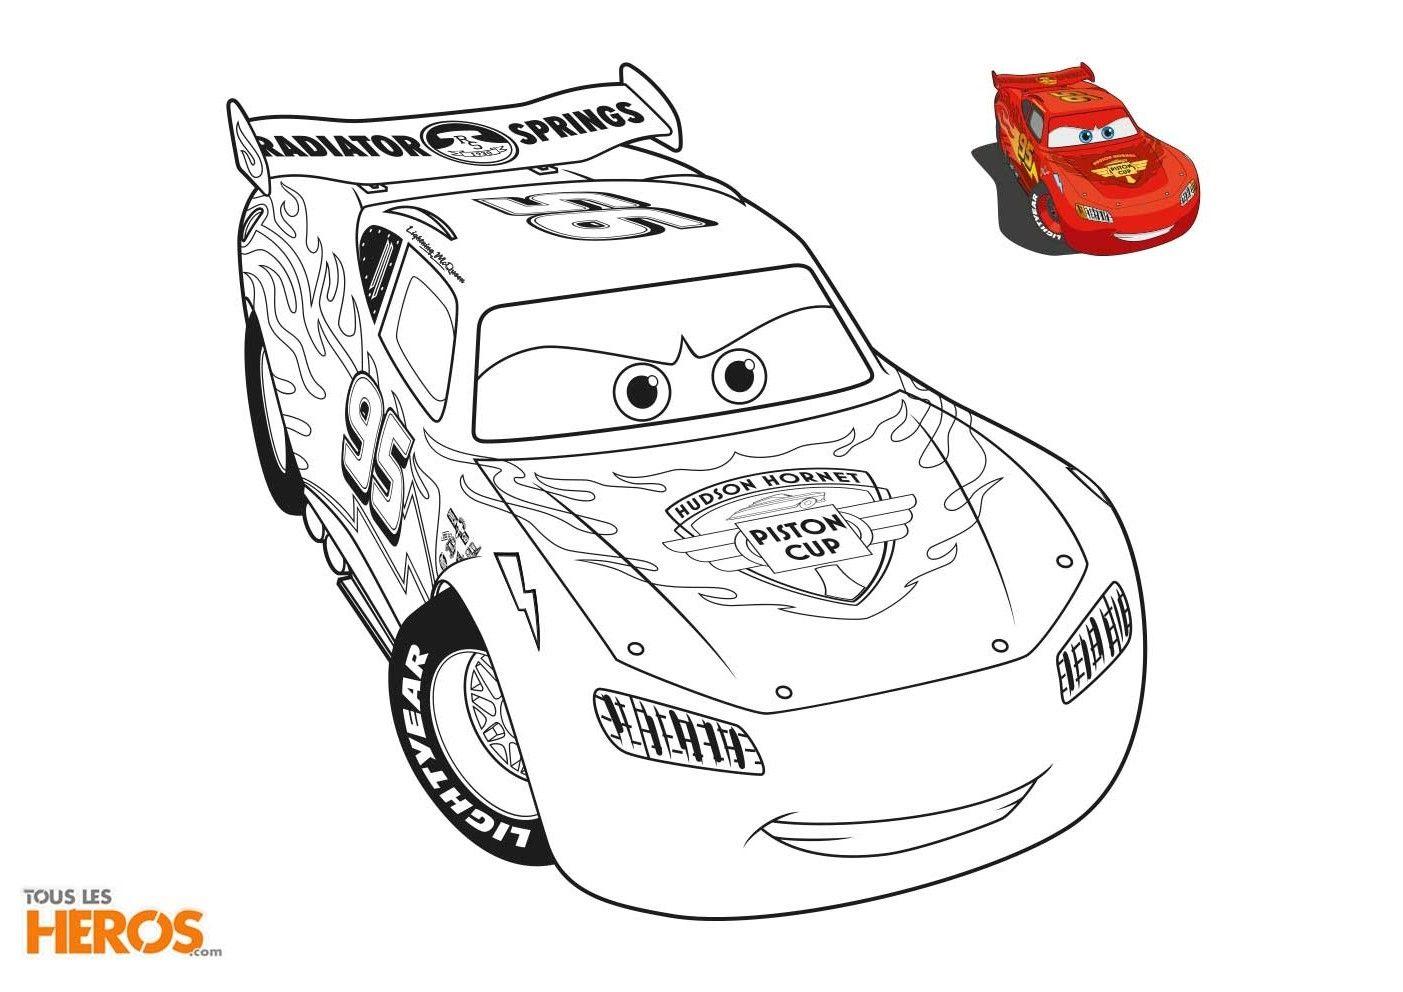 Coloriage Flash Mcqueen Et Martin A Imprimer Gembl Mega concernant Dessin À Colorier Cars